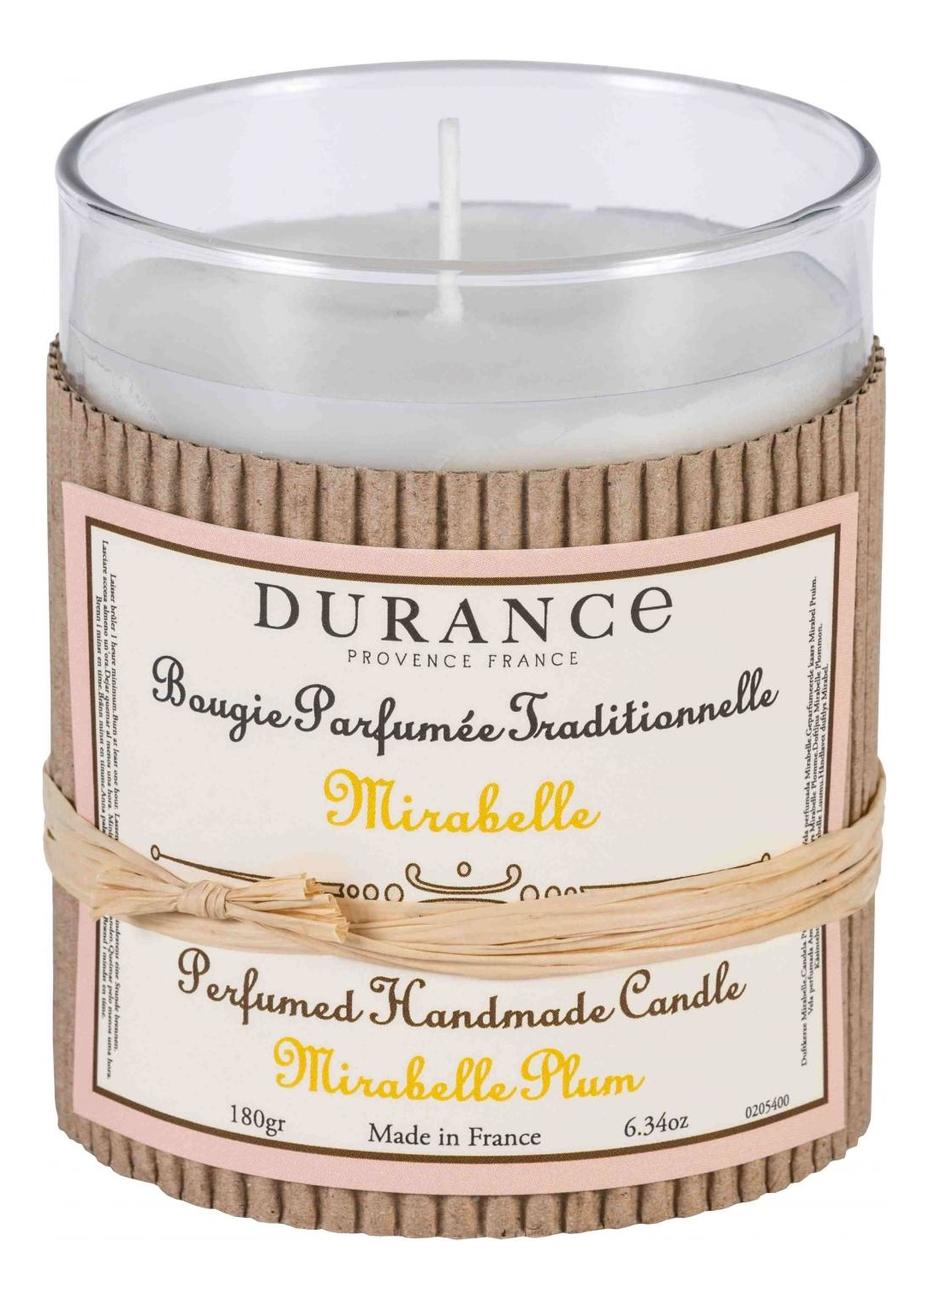 Ароматическая свеча Perfumed Handmade Candle Mirabelle Plum 180г ароматическая свеча perfumed candle cashmere wood 180г дерево кашемира